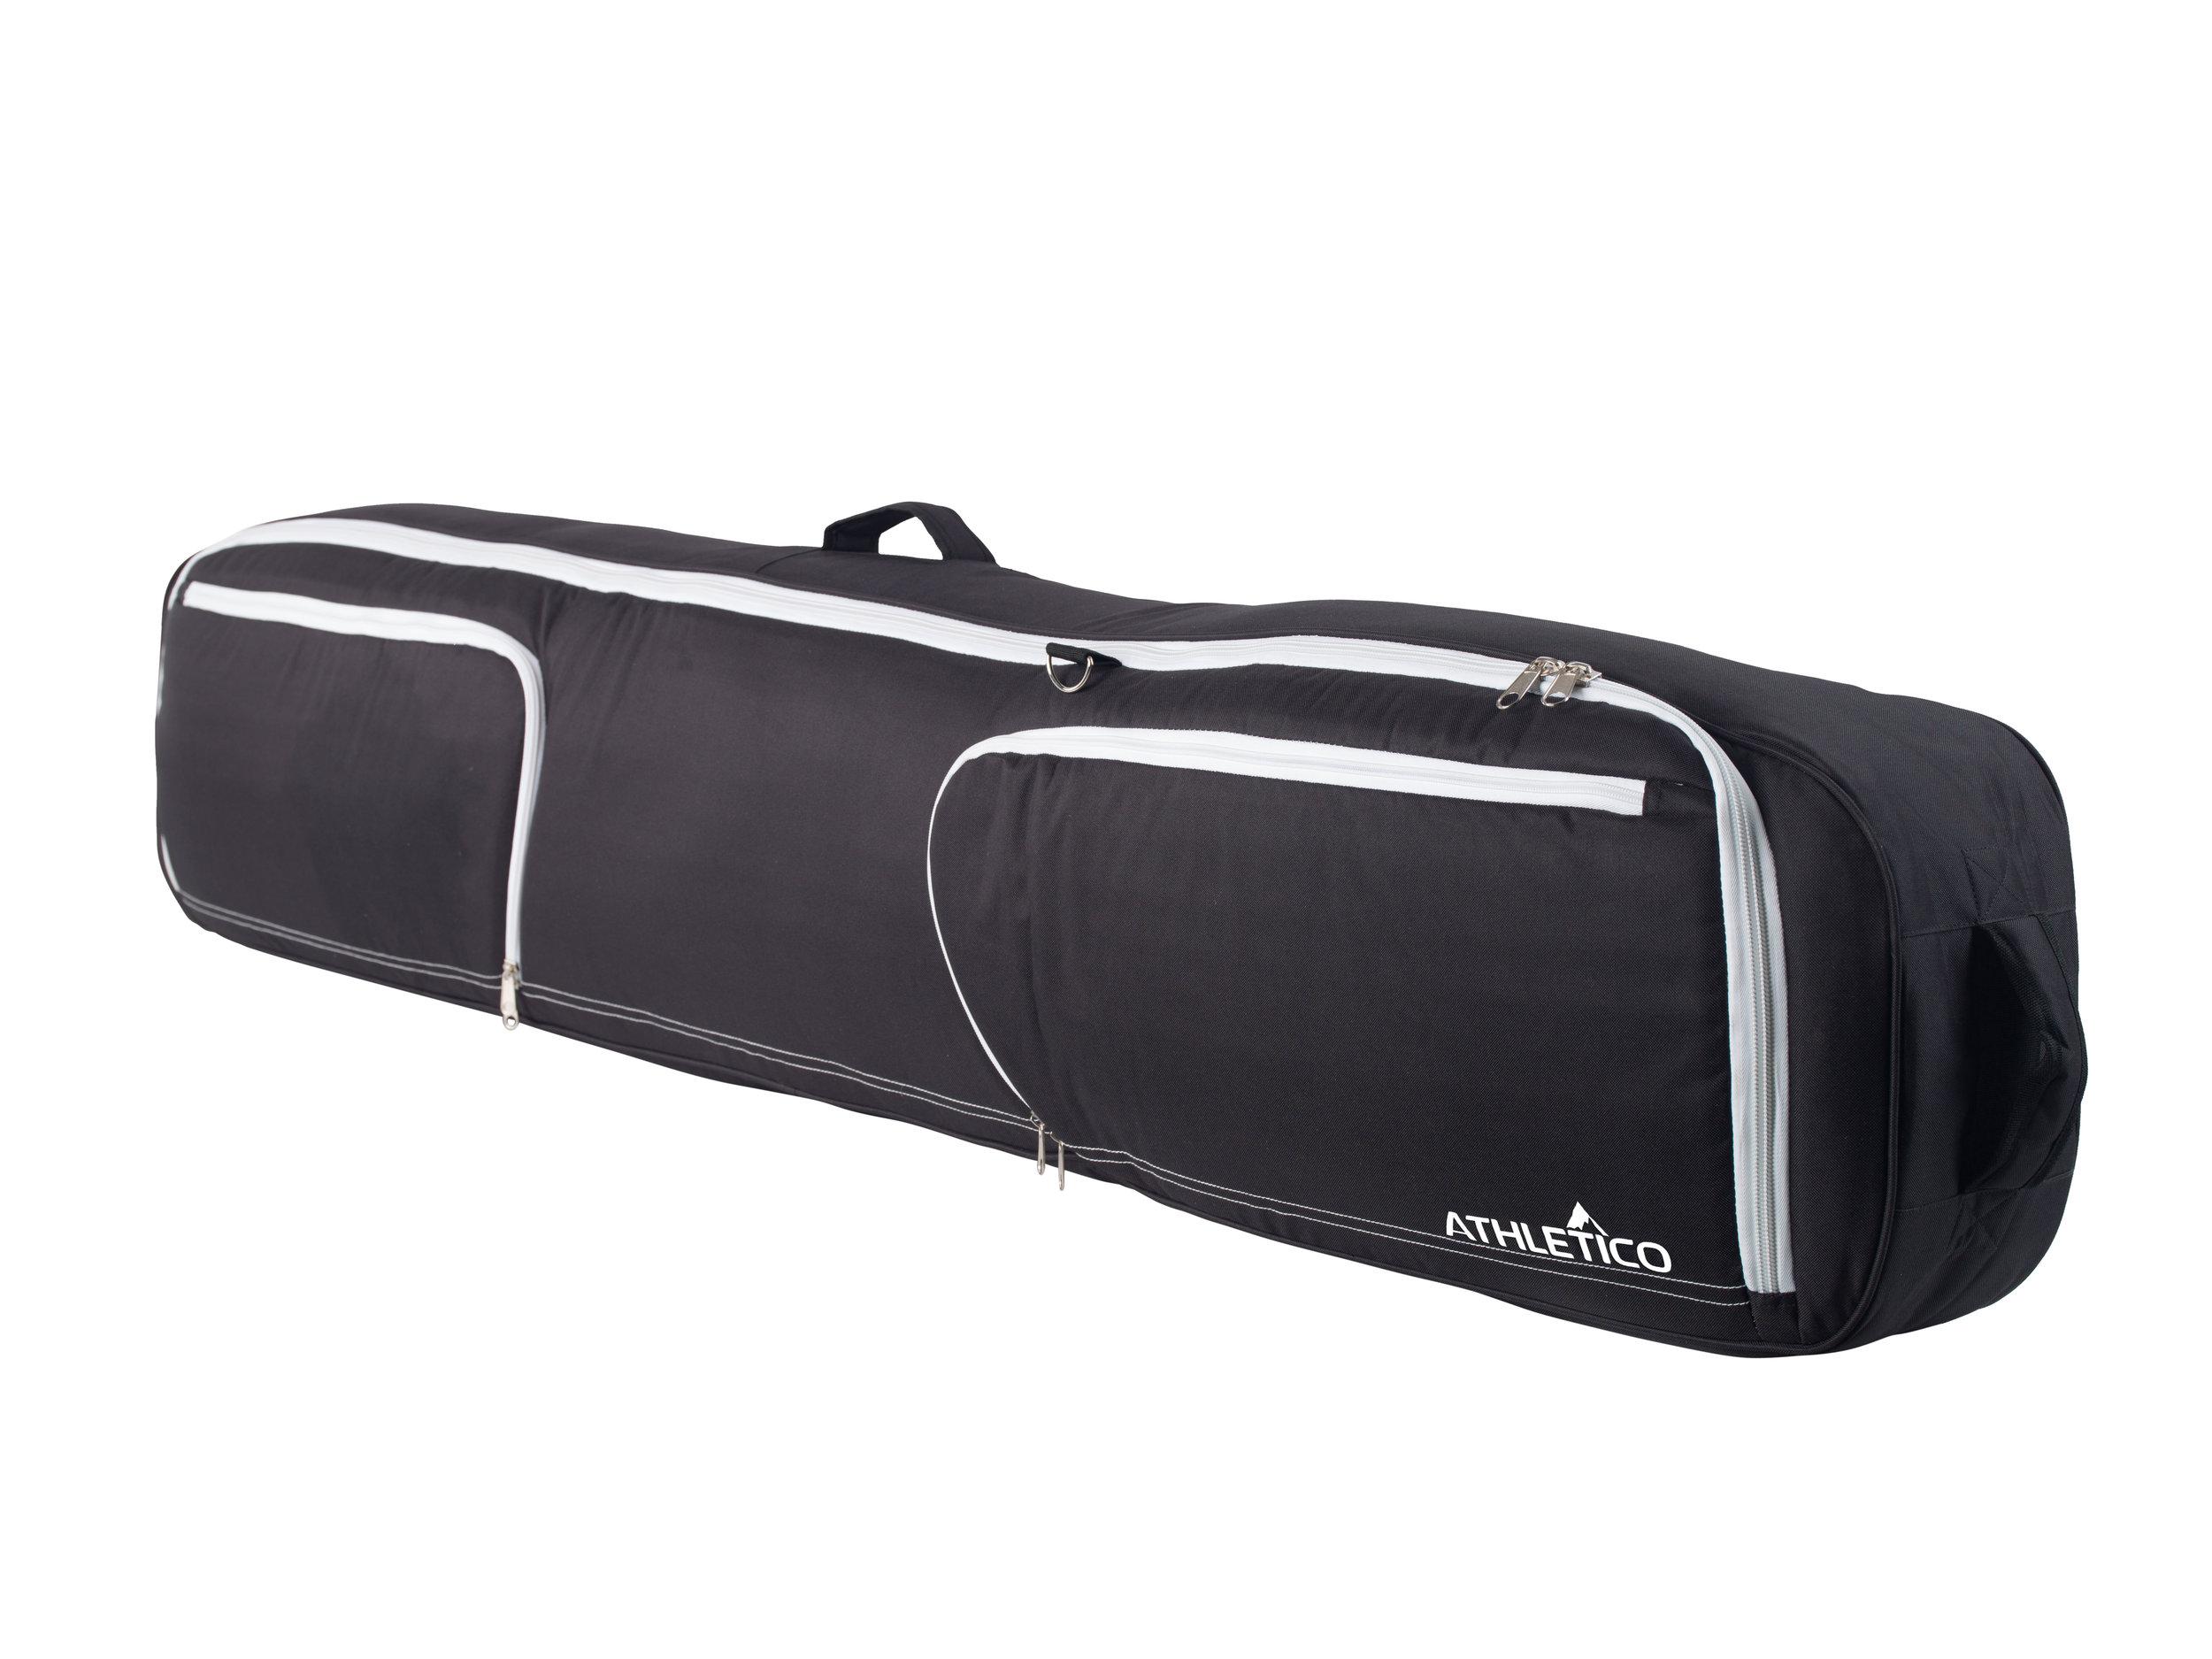 Maverick - Deluxe Snowboard Travel Bag